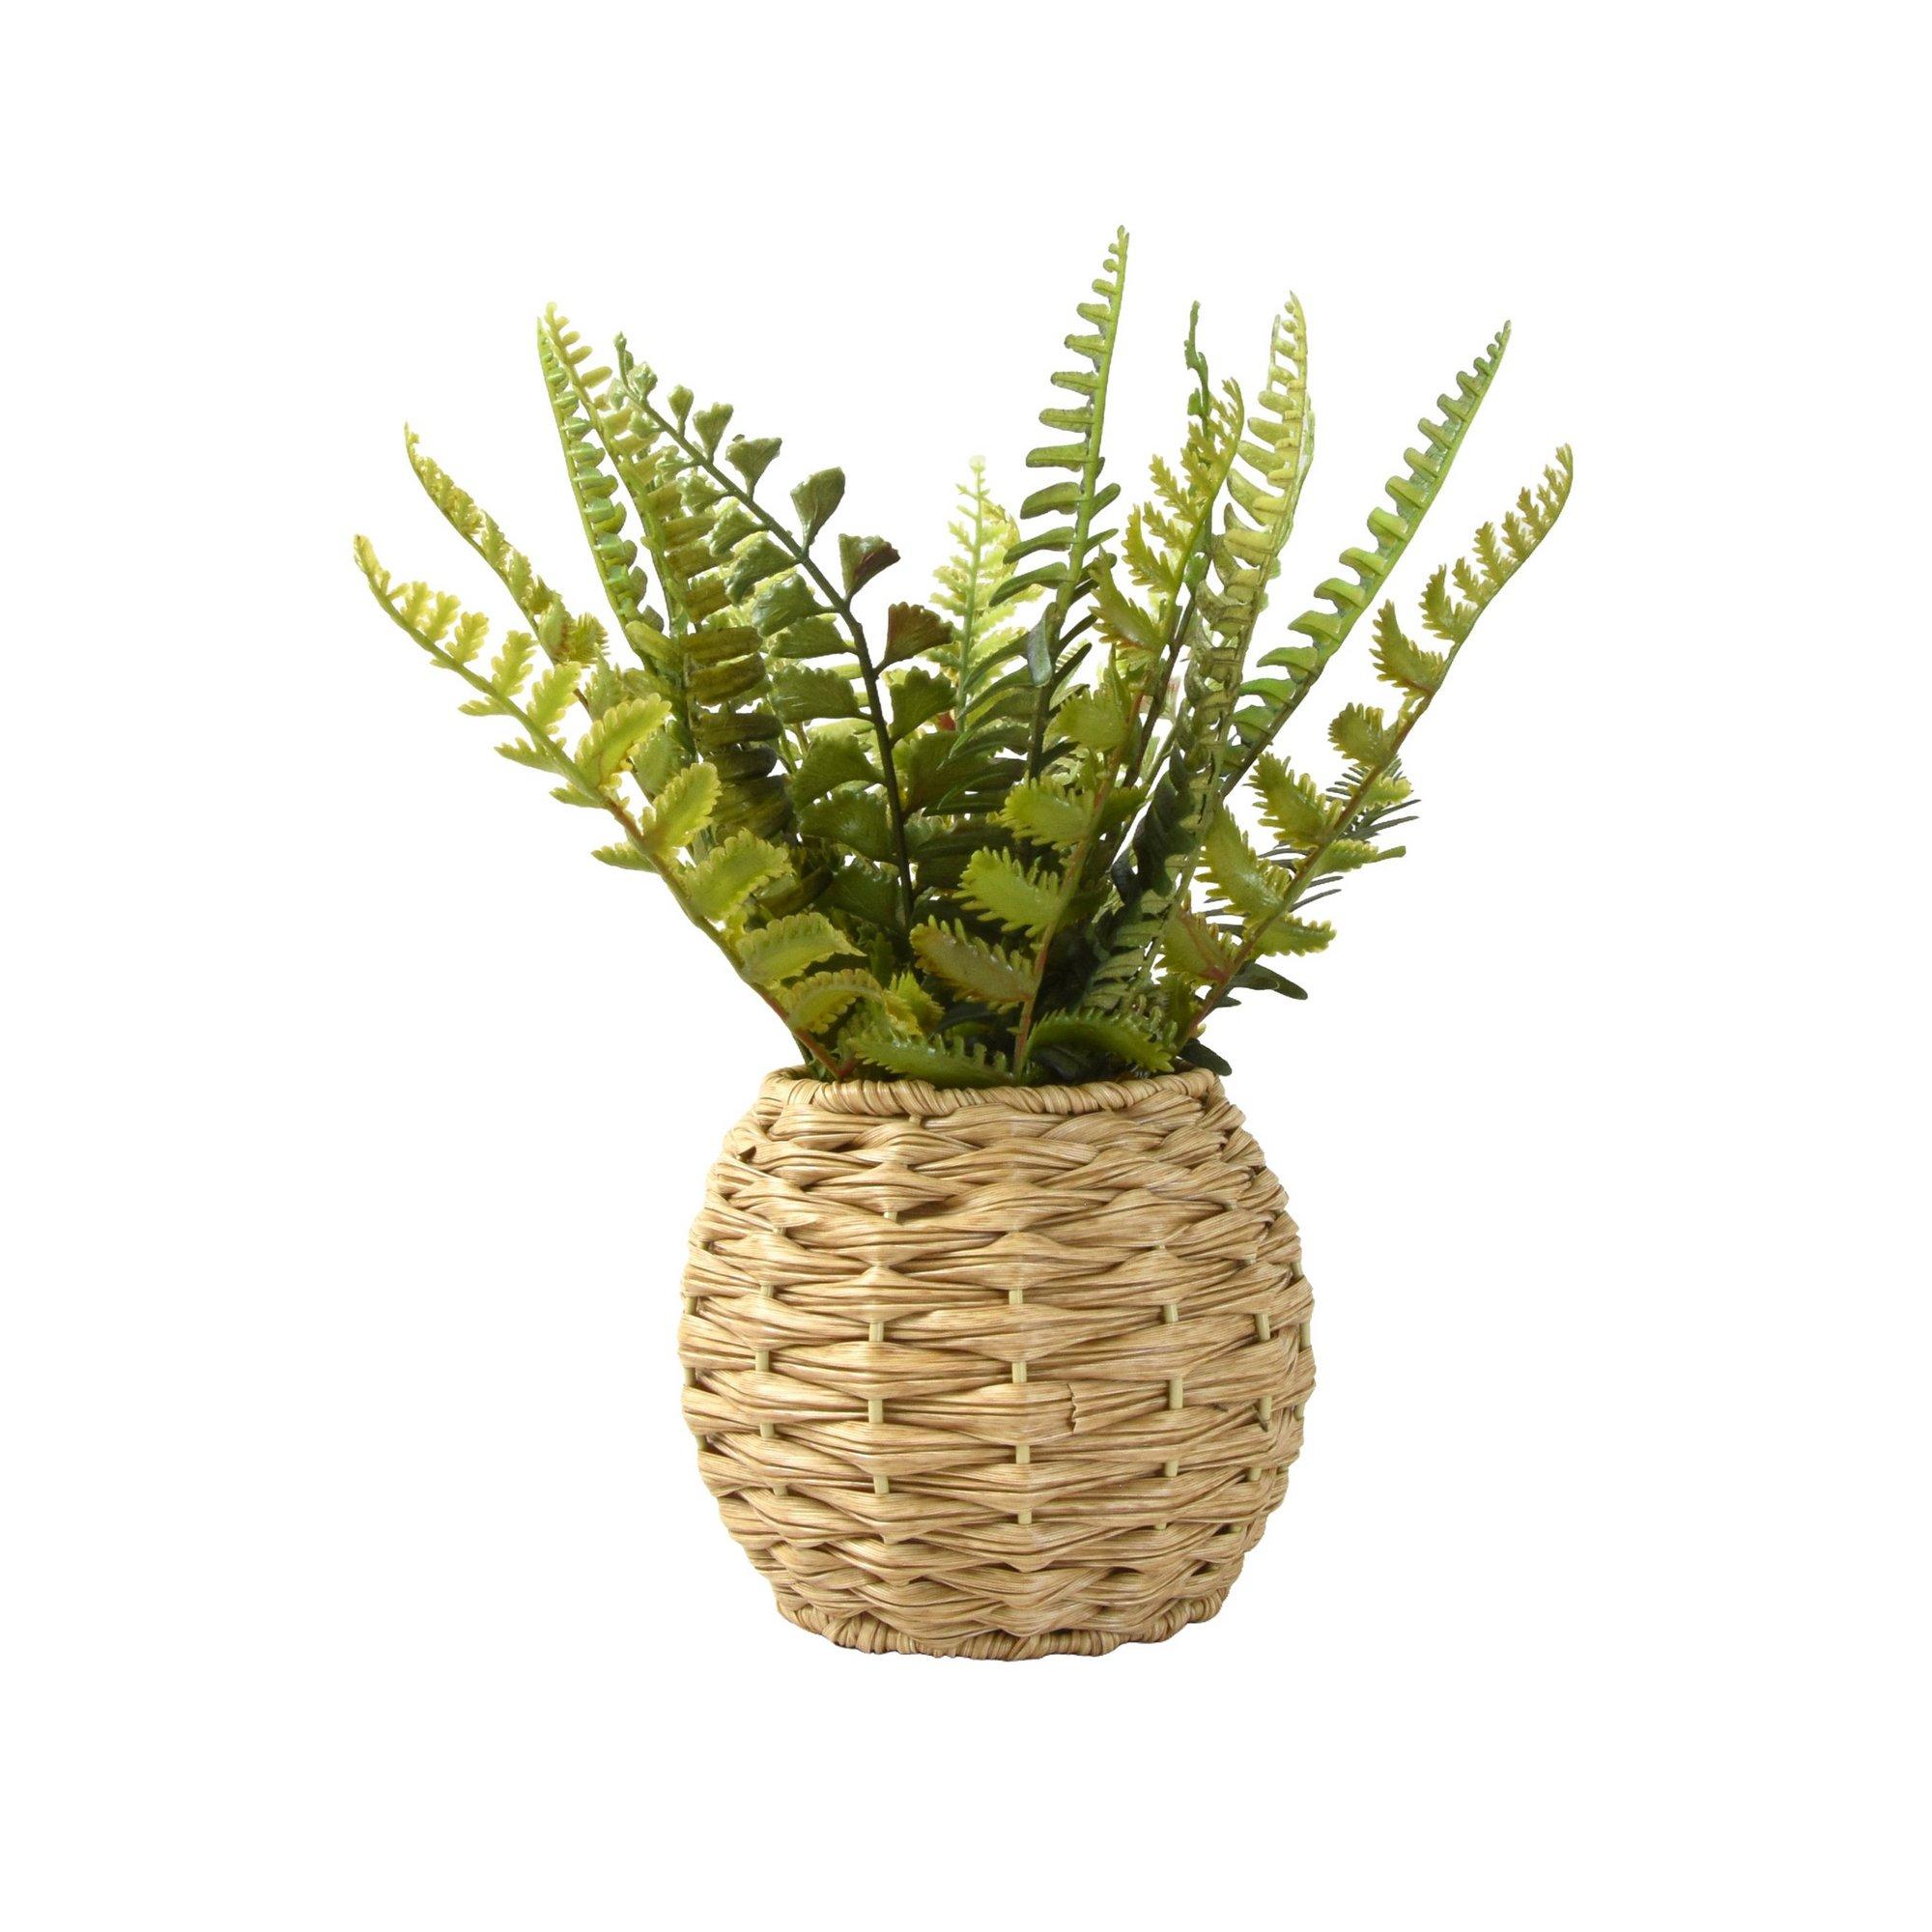 Image of Fern in Rattan Pot